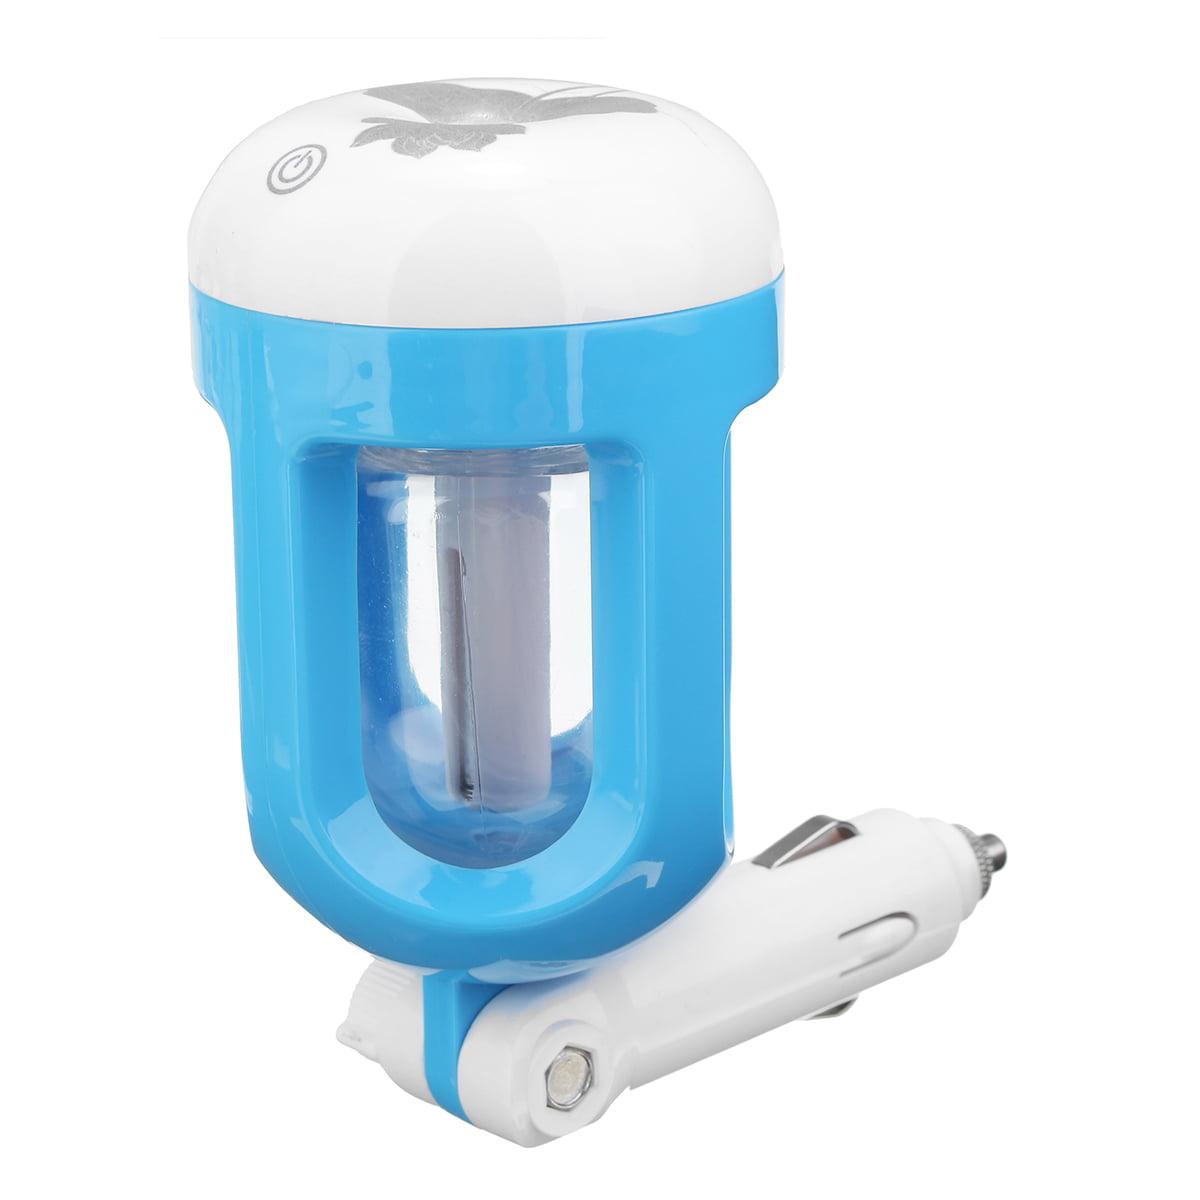 12V Mini Car Humidifier Air Purifier Freshener Aroma Diffuser Essential Oil Diffuser Aromatherapy Mist Maker Fogger Humidificador